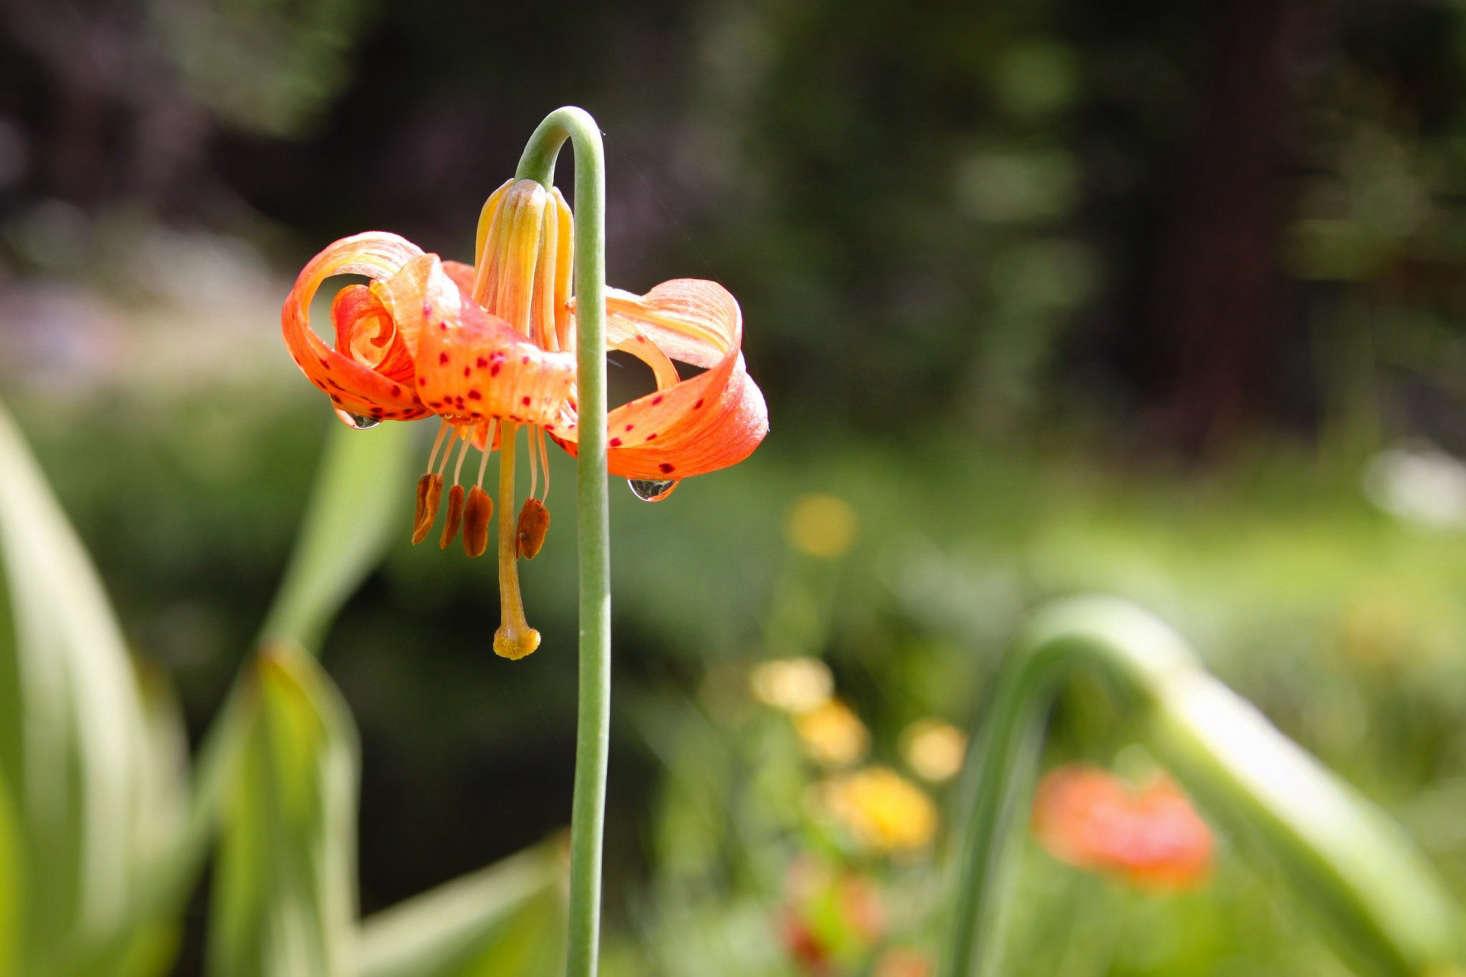 An orange Leopard Lily (Lilium henryi) can grow as high as 8 feet. Photograph by Odonata98 via Flickr.